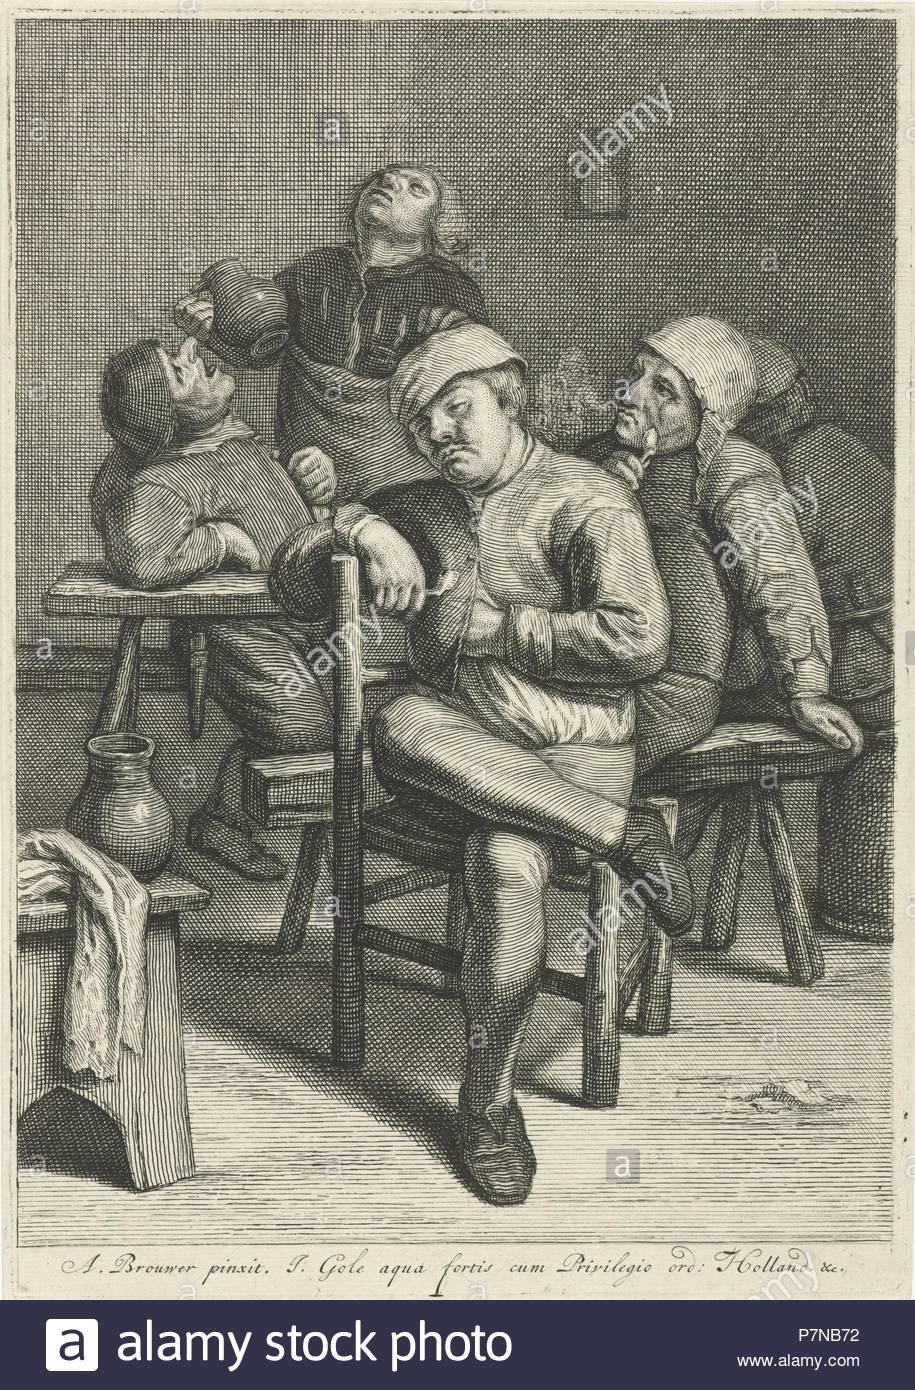 Tavern Scene with smoking farmers, Jacob Gole, Republiek der Zeven Verenigde Nederlanden, 1670 - 1724. - Stock Image